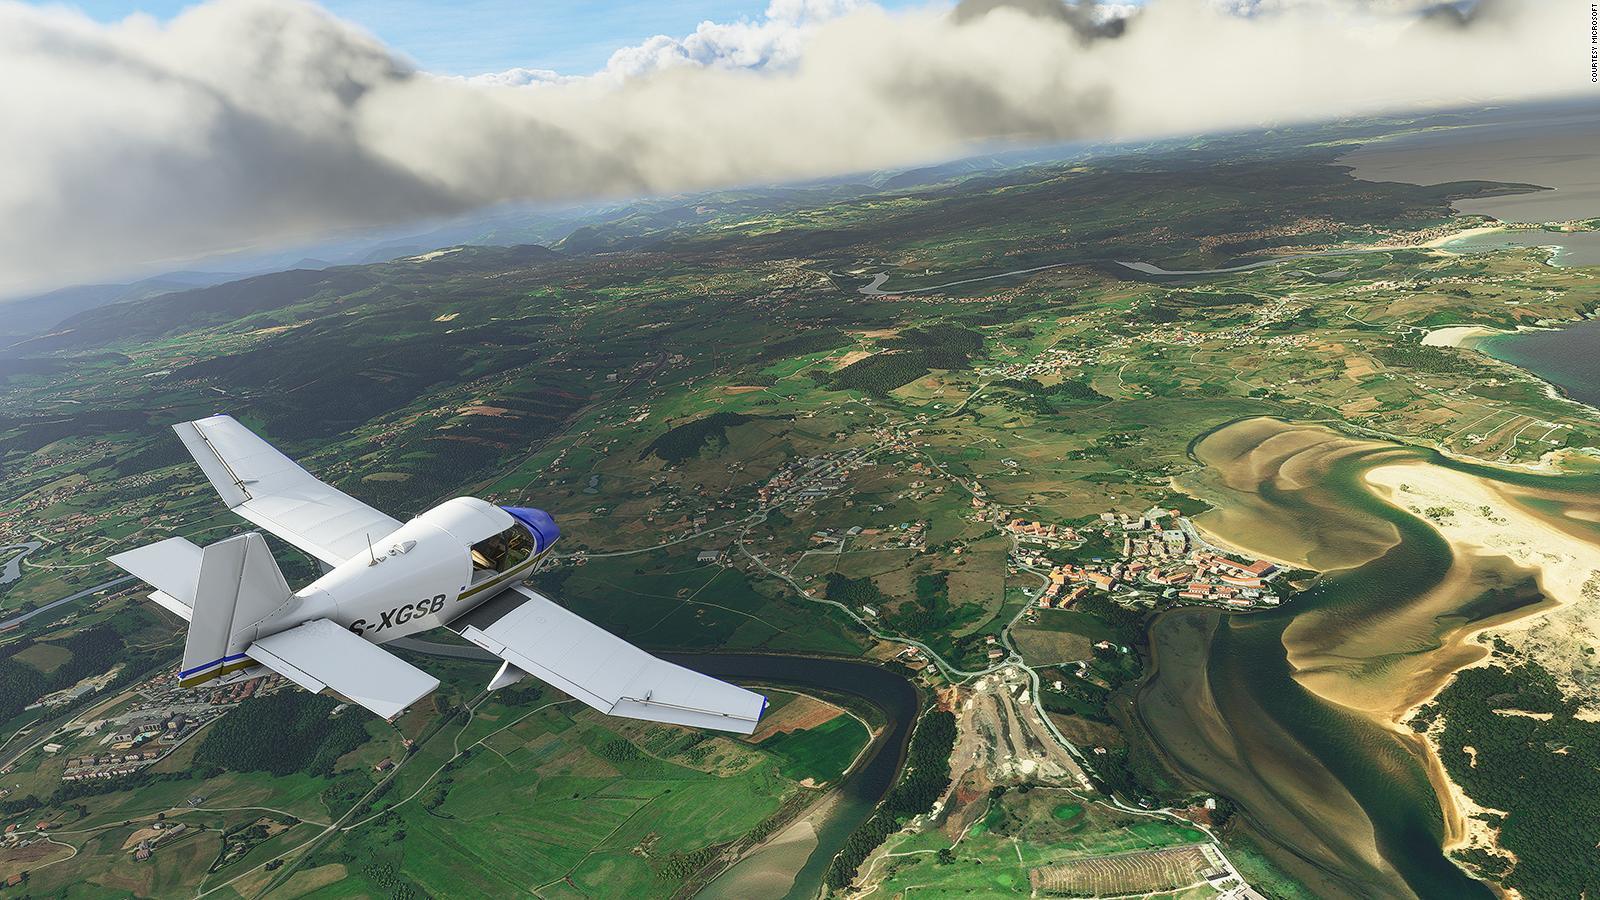 MICROSOFT FLIGHT SIMULATOR WILL TAKE 150GB OF DISK SPACE